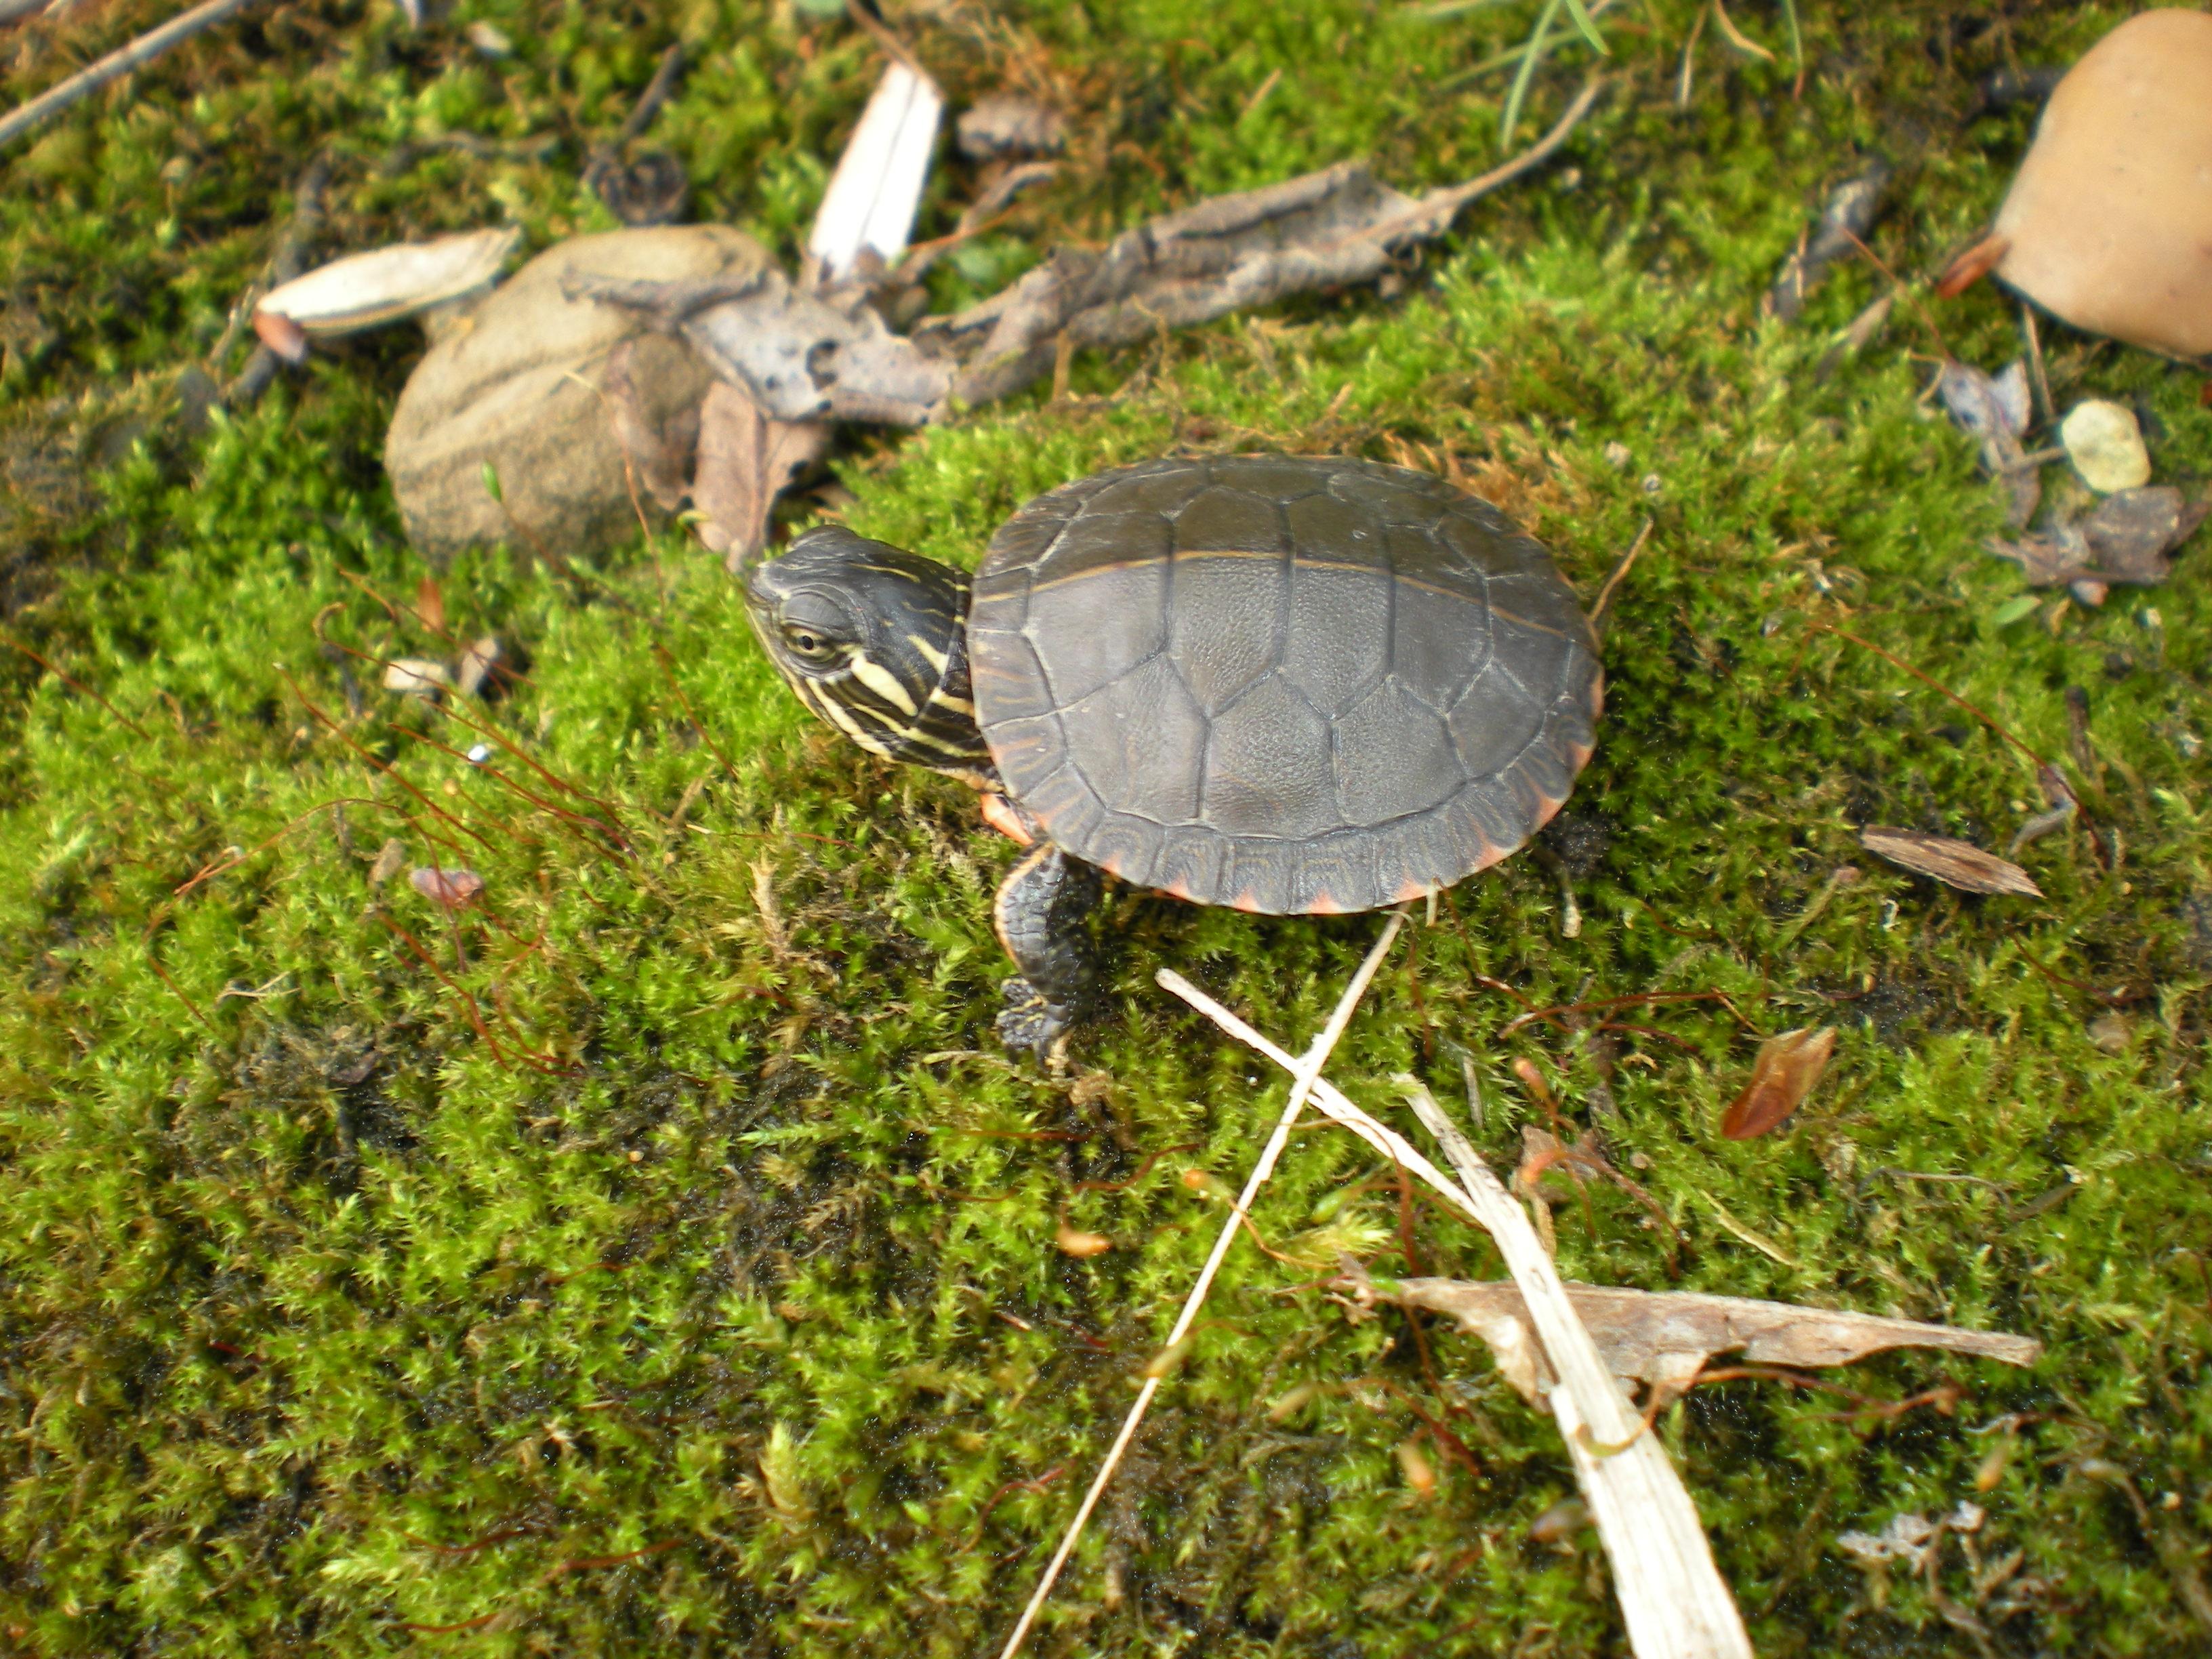 Chrysemys picta marginata, UW-Parkside, Kenosha, WI, 6 May 2015.